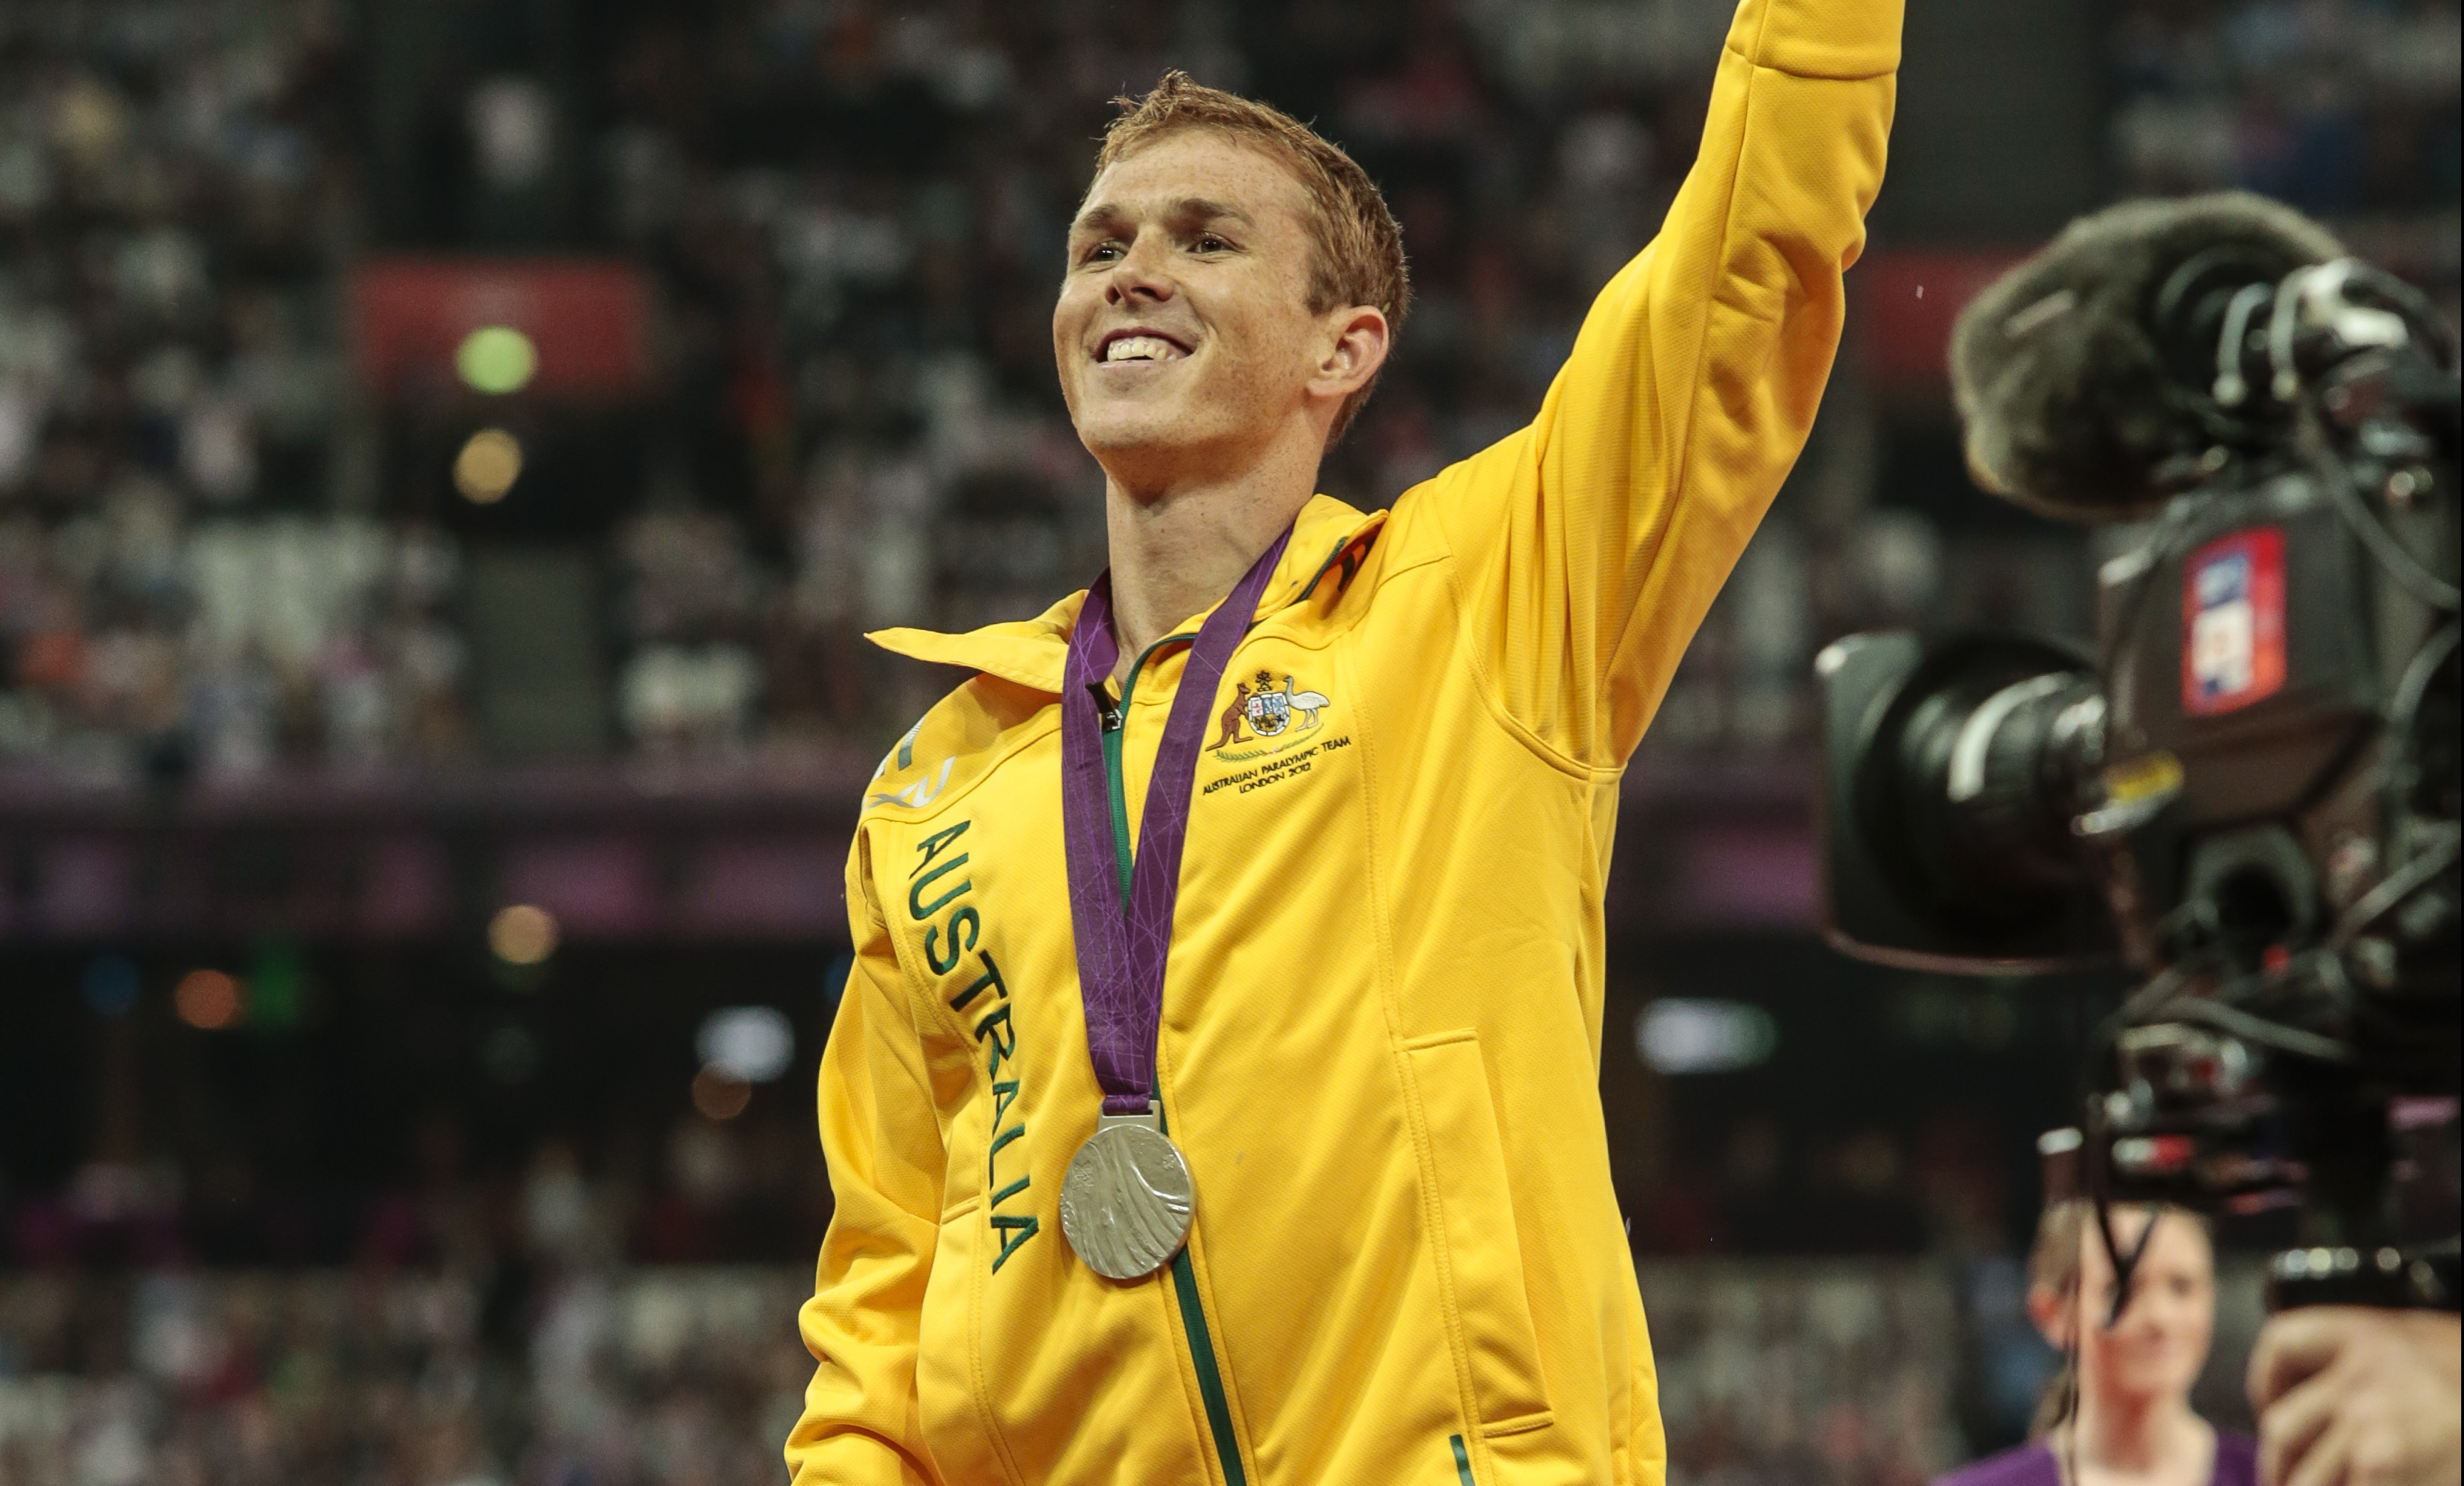 Multiple Paralympic medallist Brad Scott announces his retirement